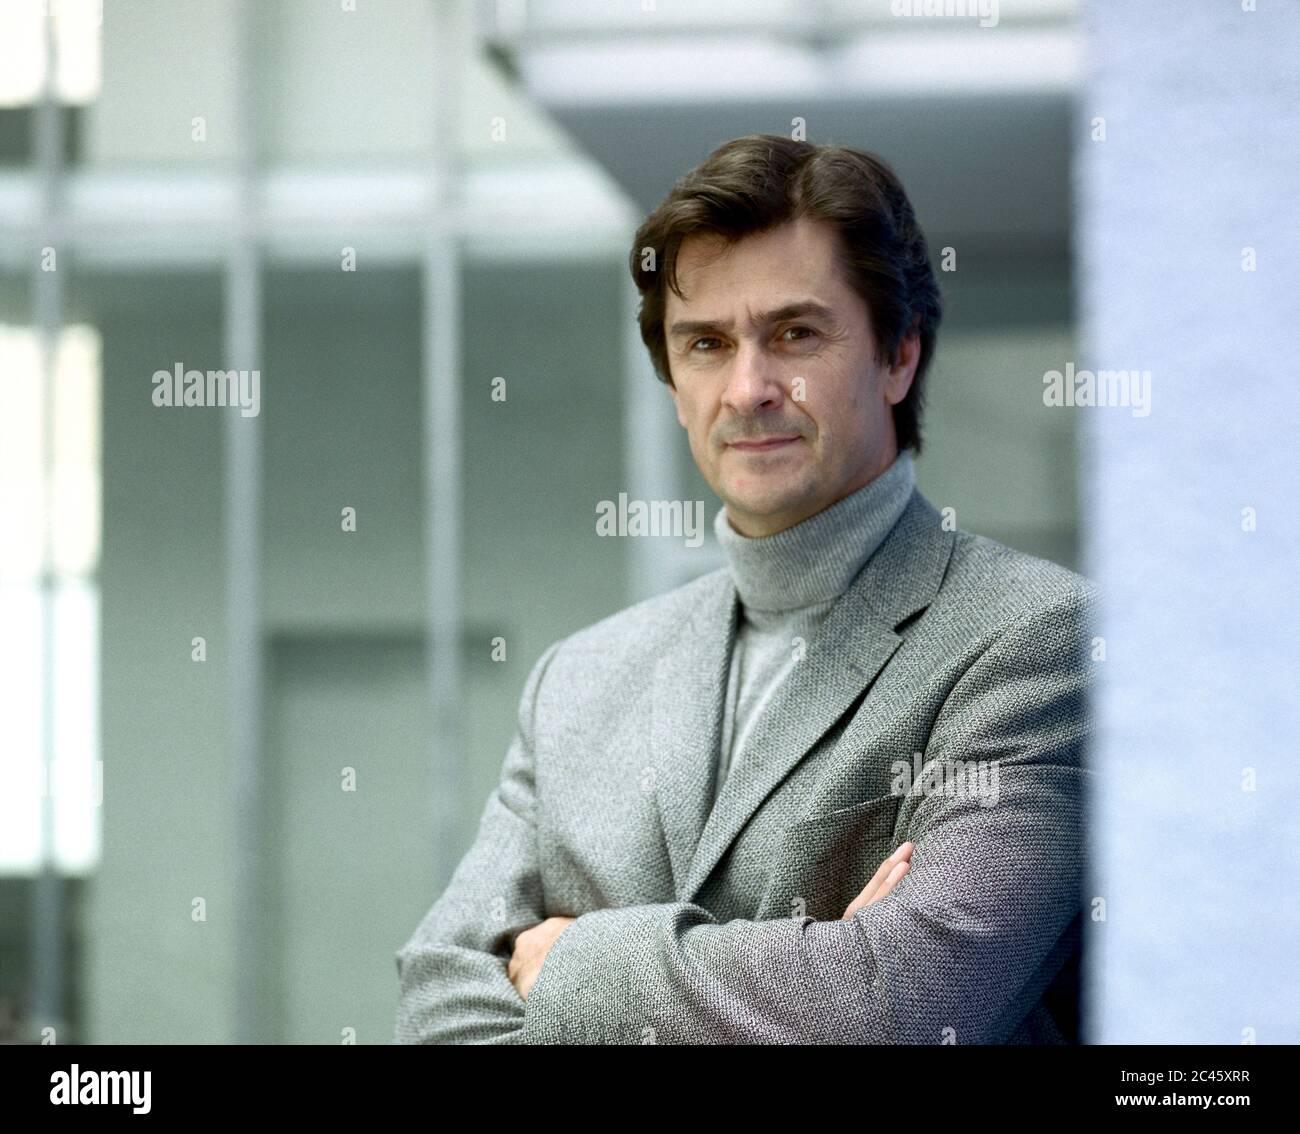 Joachim Dolatschko - managing director and financial broker at fc finanz consult Maklergesellschaft mbH Stock Photo